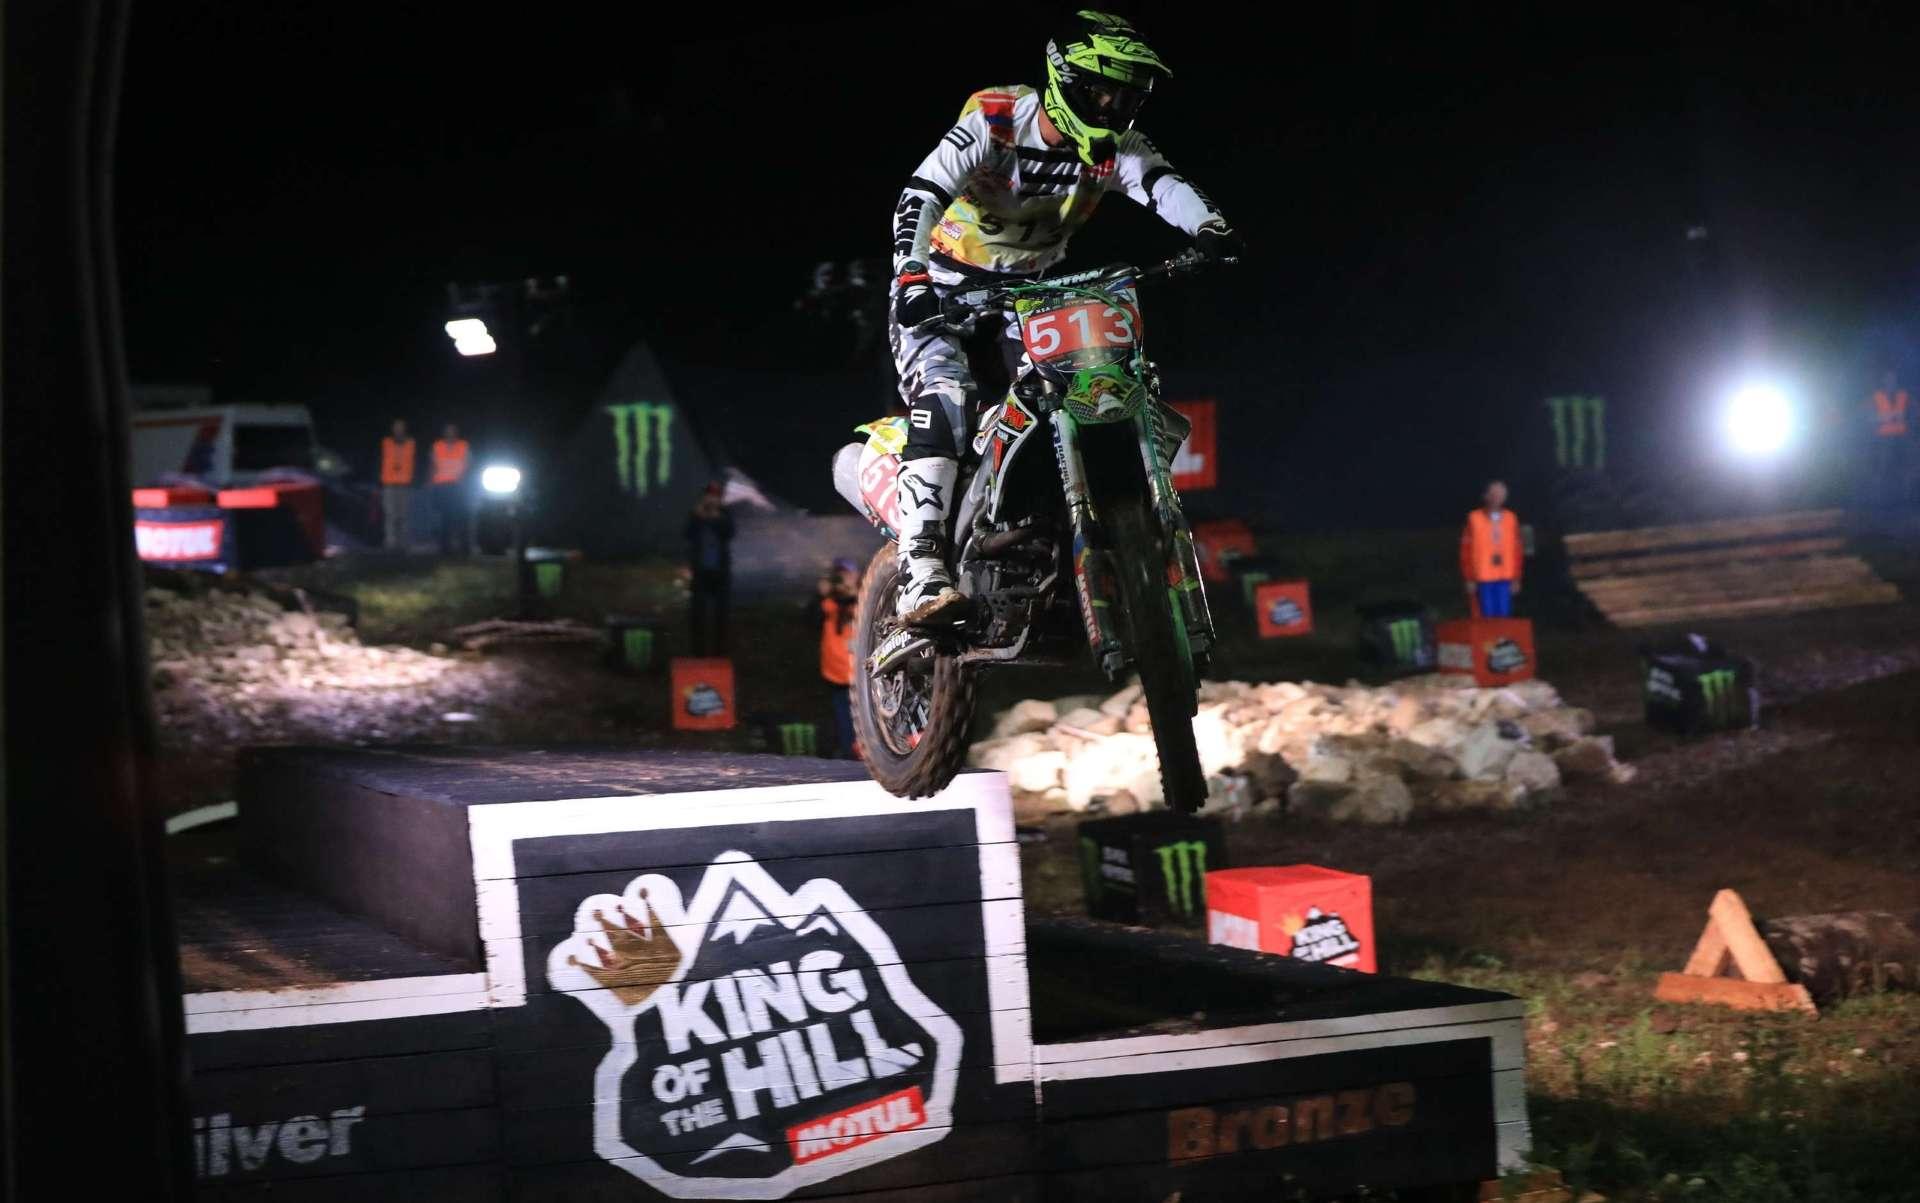 Motul King of the Hill 2018 (Сочи): Результаты гонки